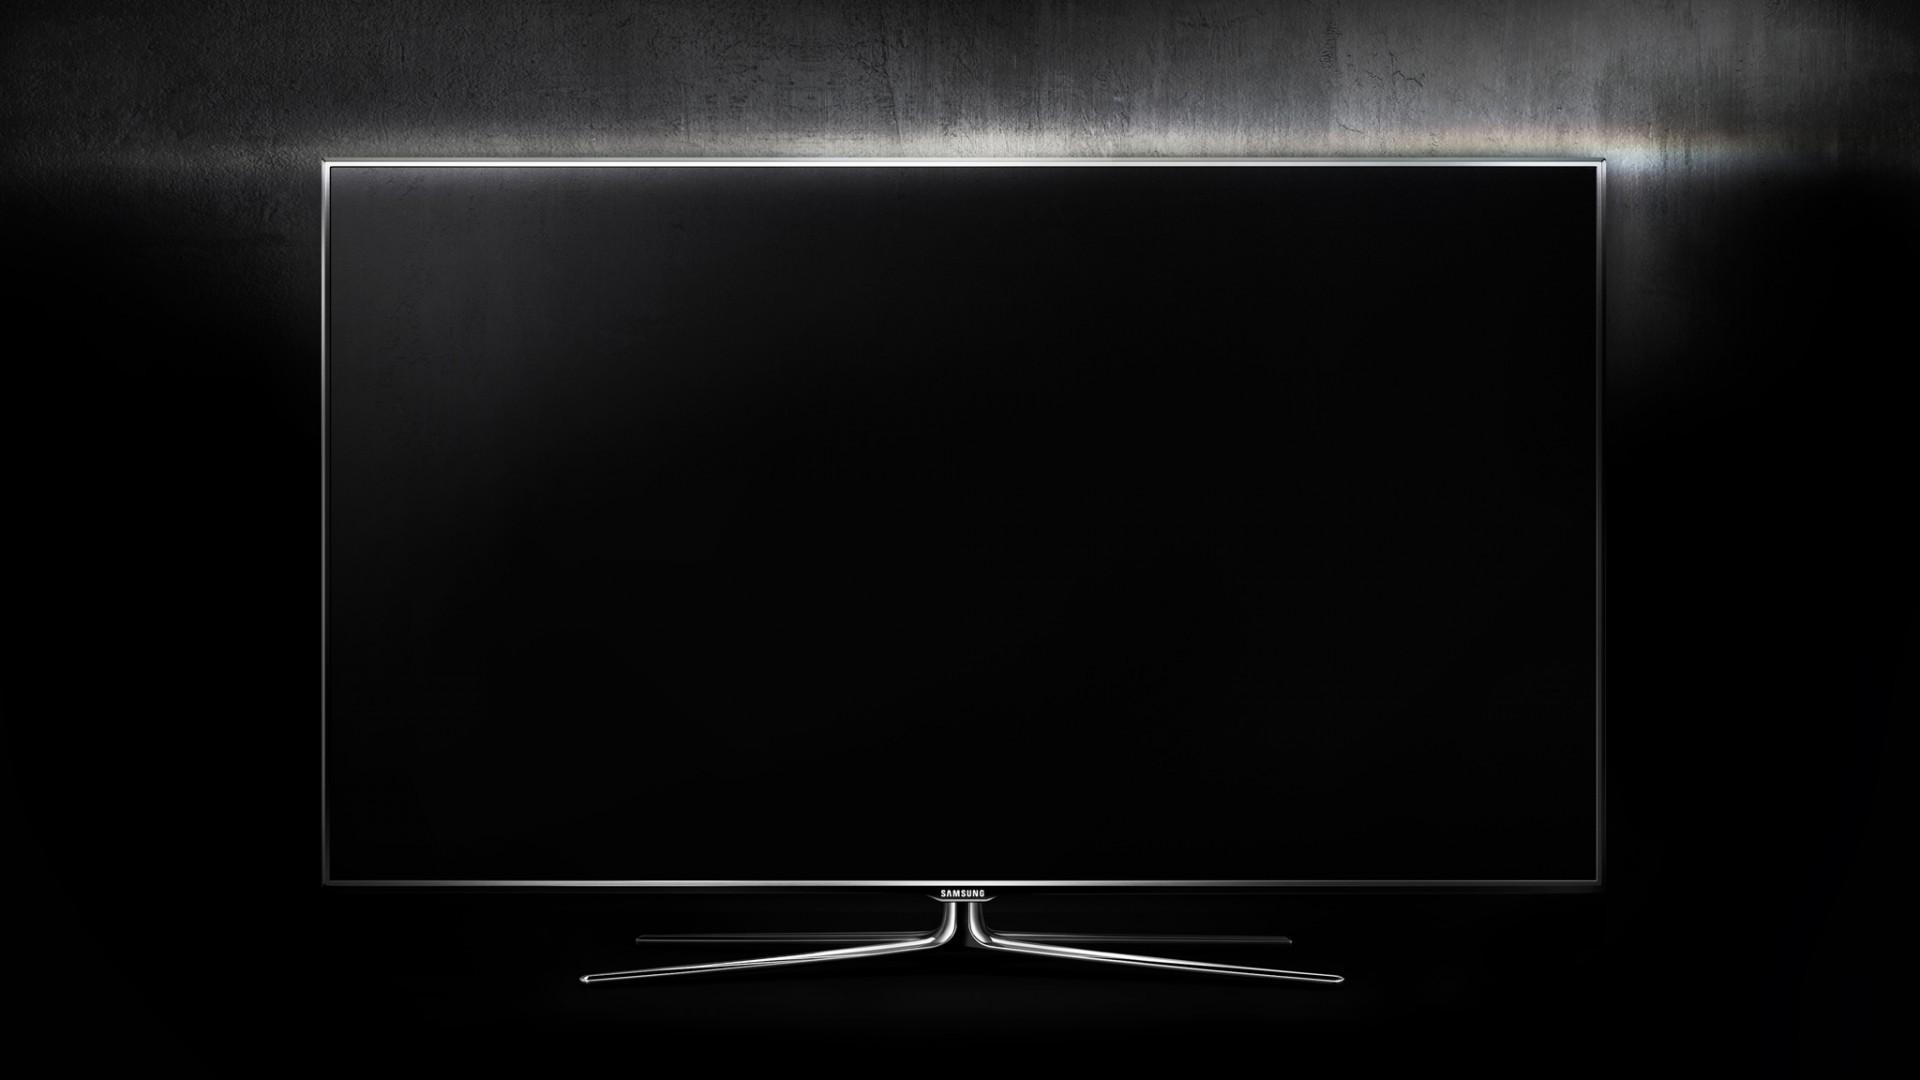 48 Samsung Tv Wallpapers On Wallpapersafari